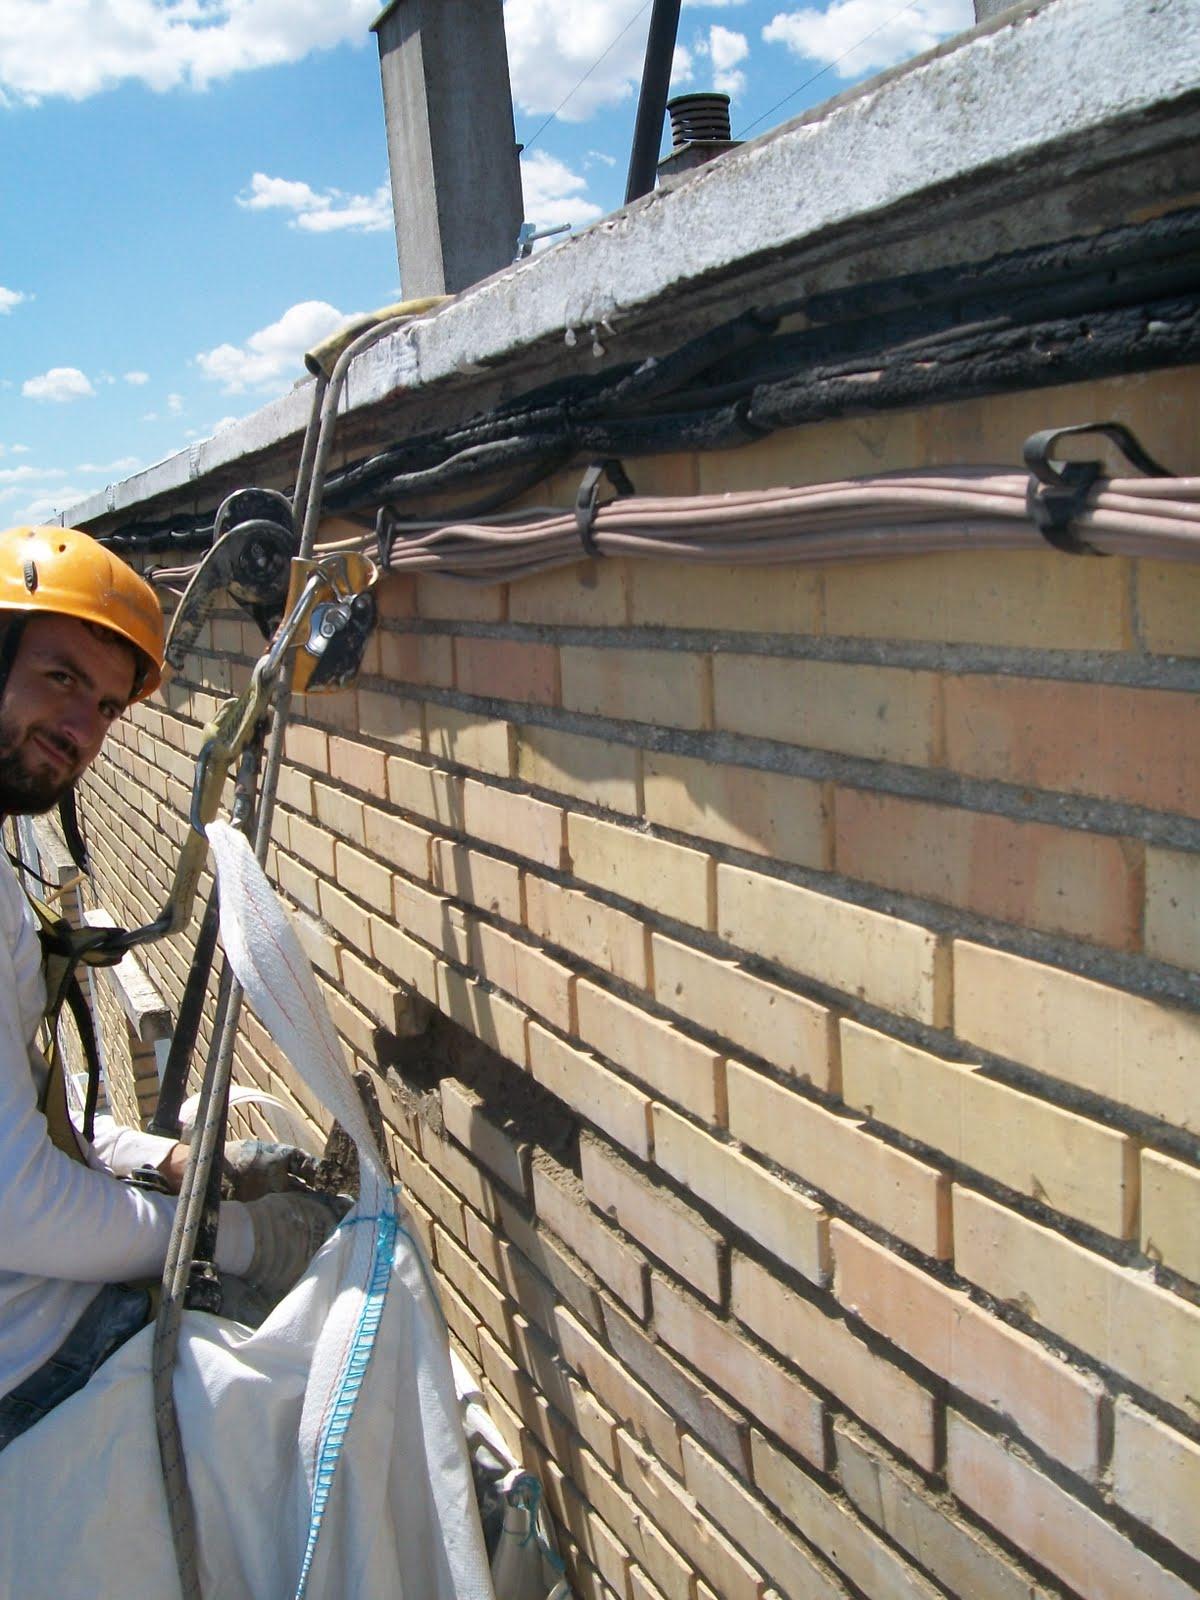 Restaurar fachada de ladrillo visto trabajos en - Fachadas ladrillo visto ...